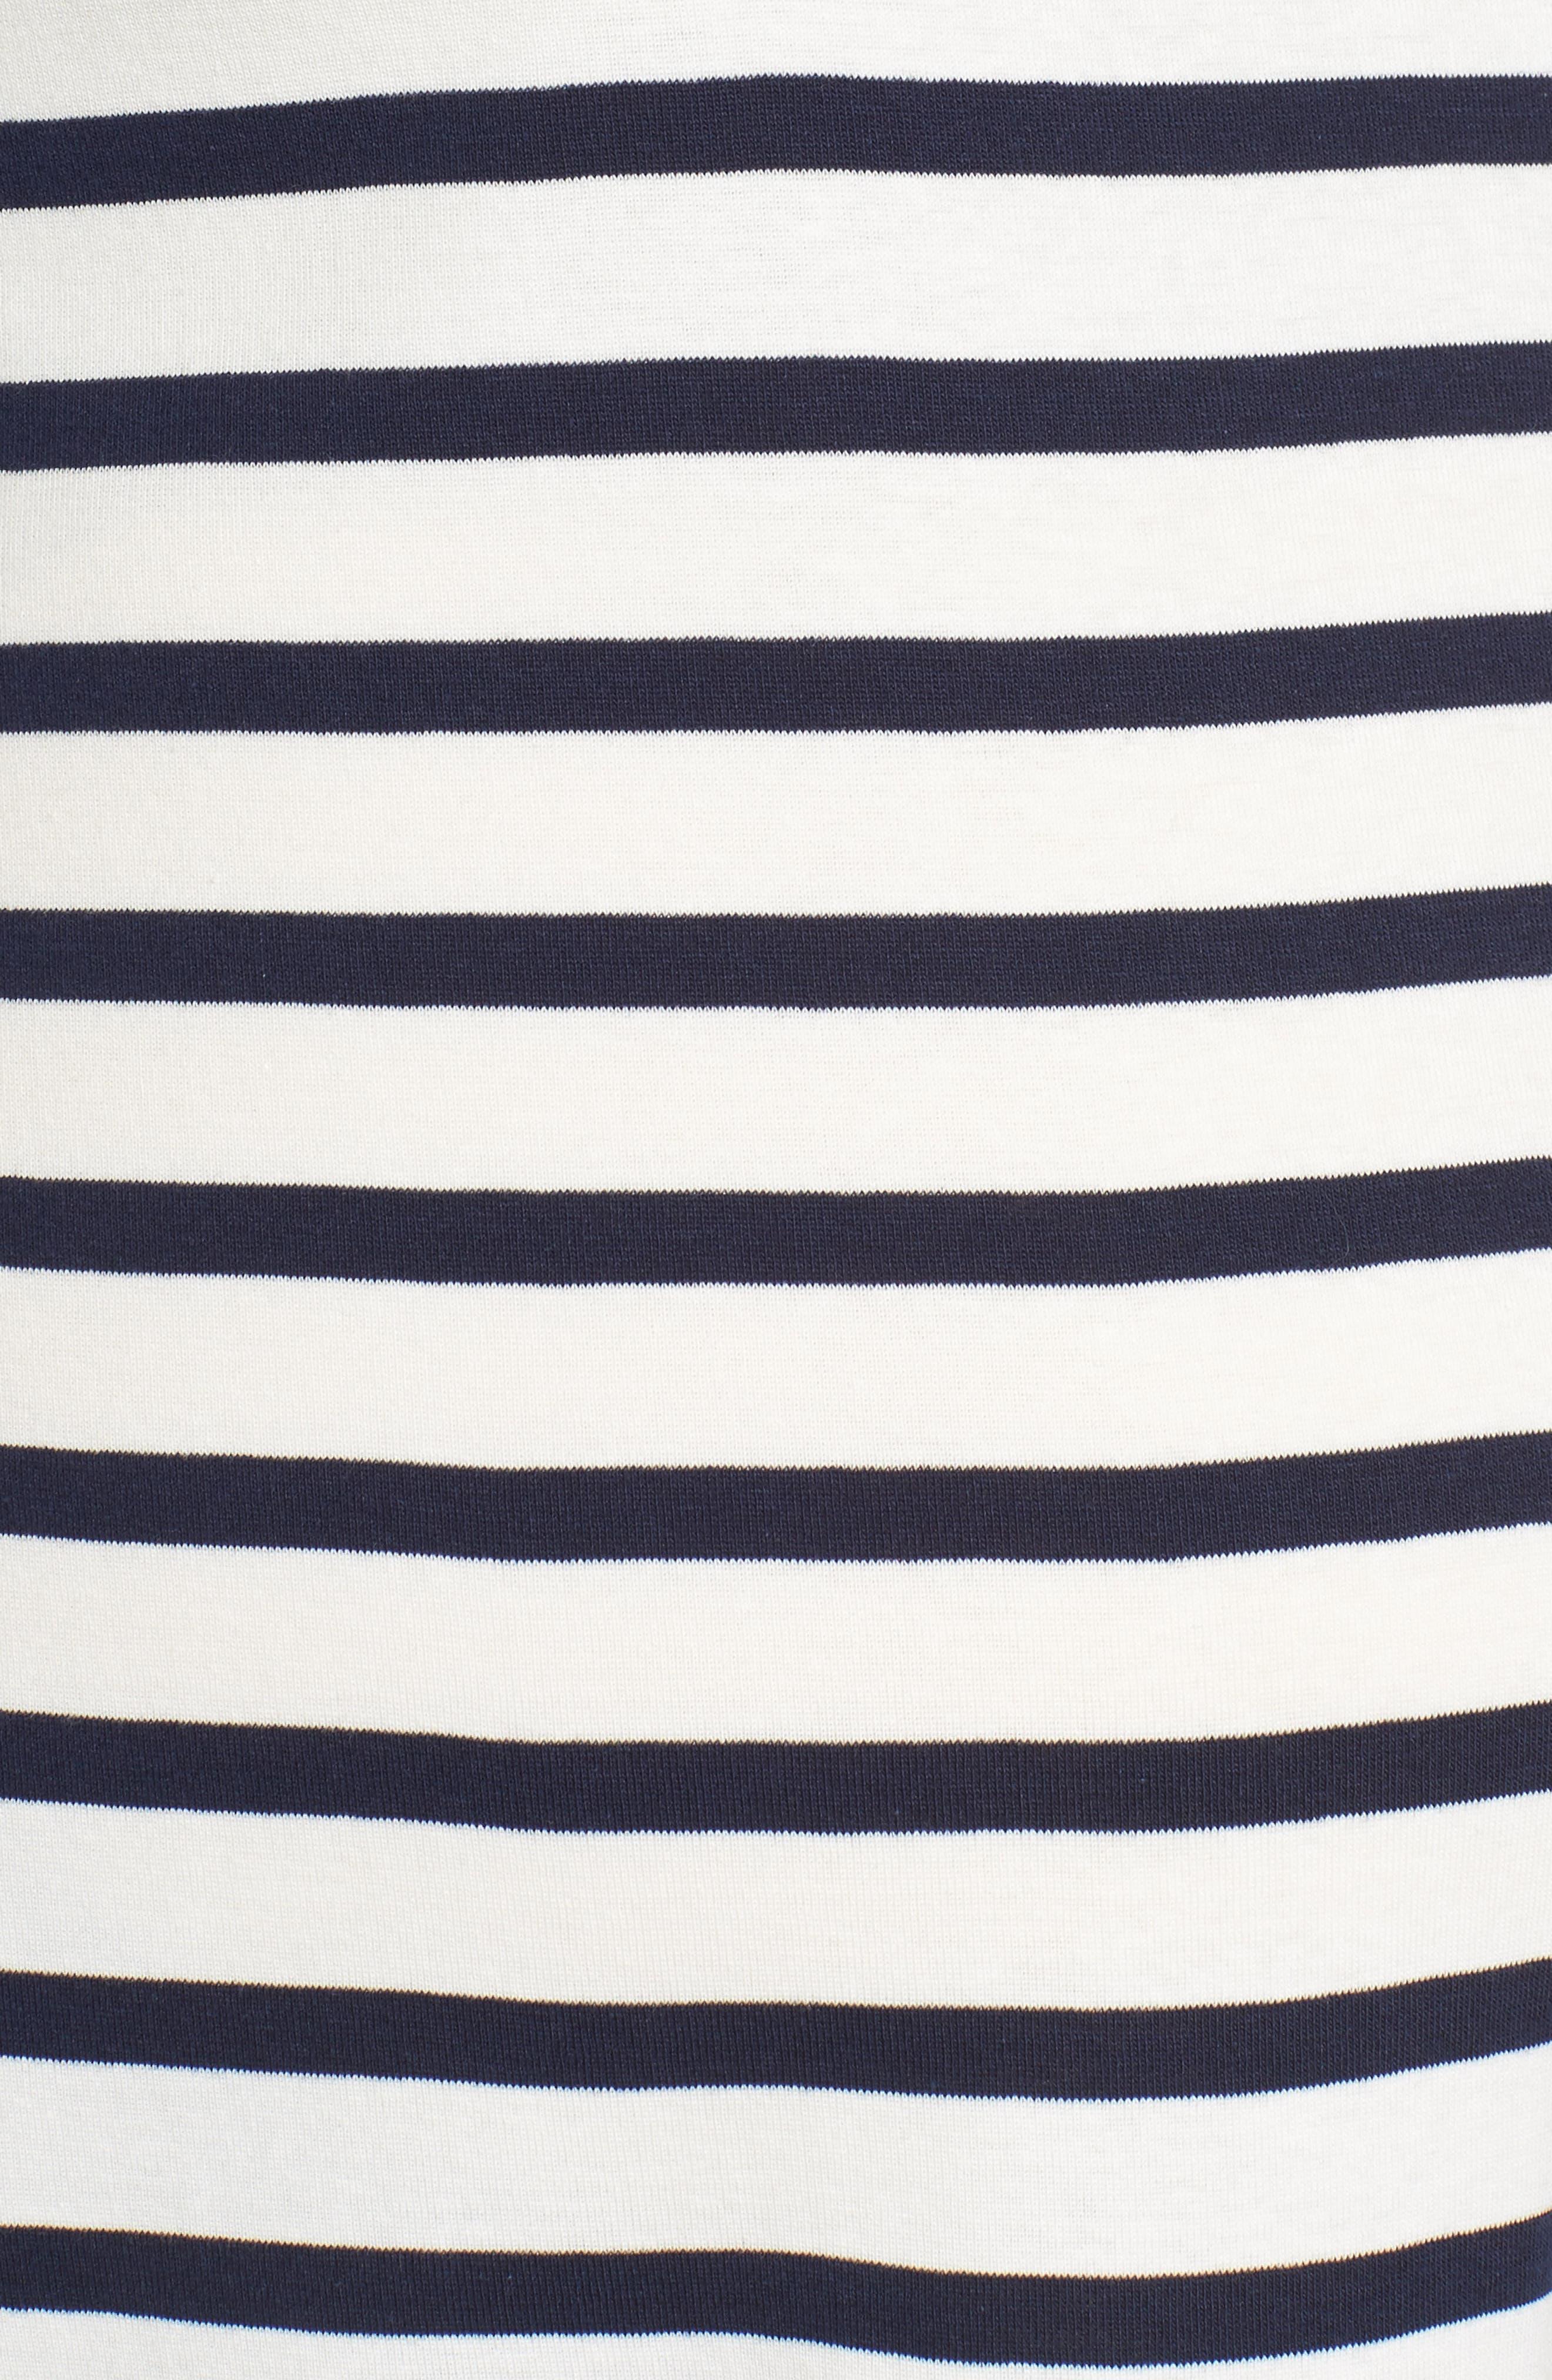 Caia Stripe Maternity Top,                             Alternate thumbnail 5, color,                             NAVY/ WHITE STRIPE